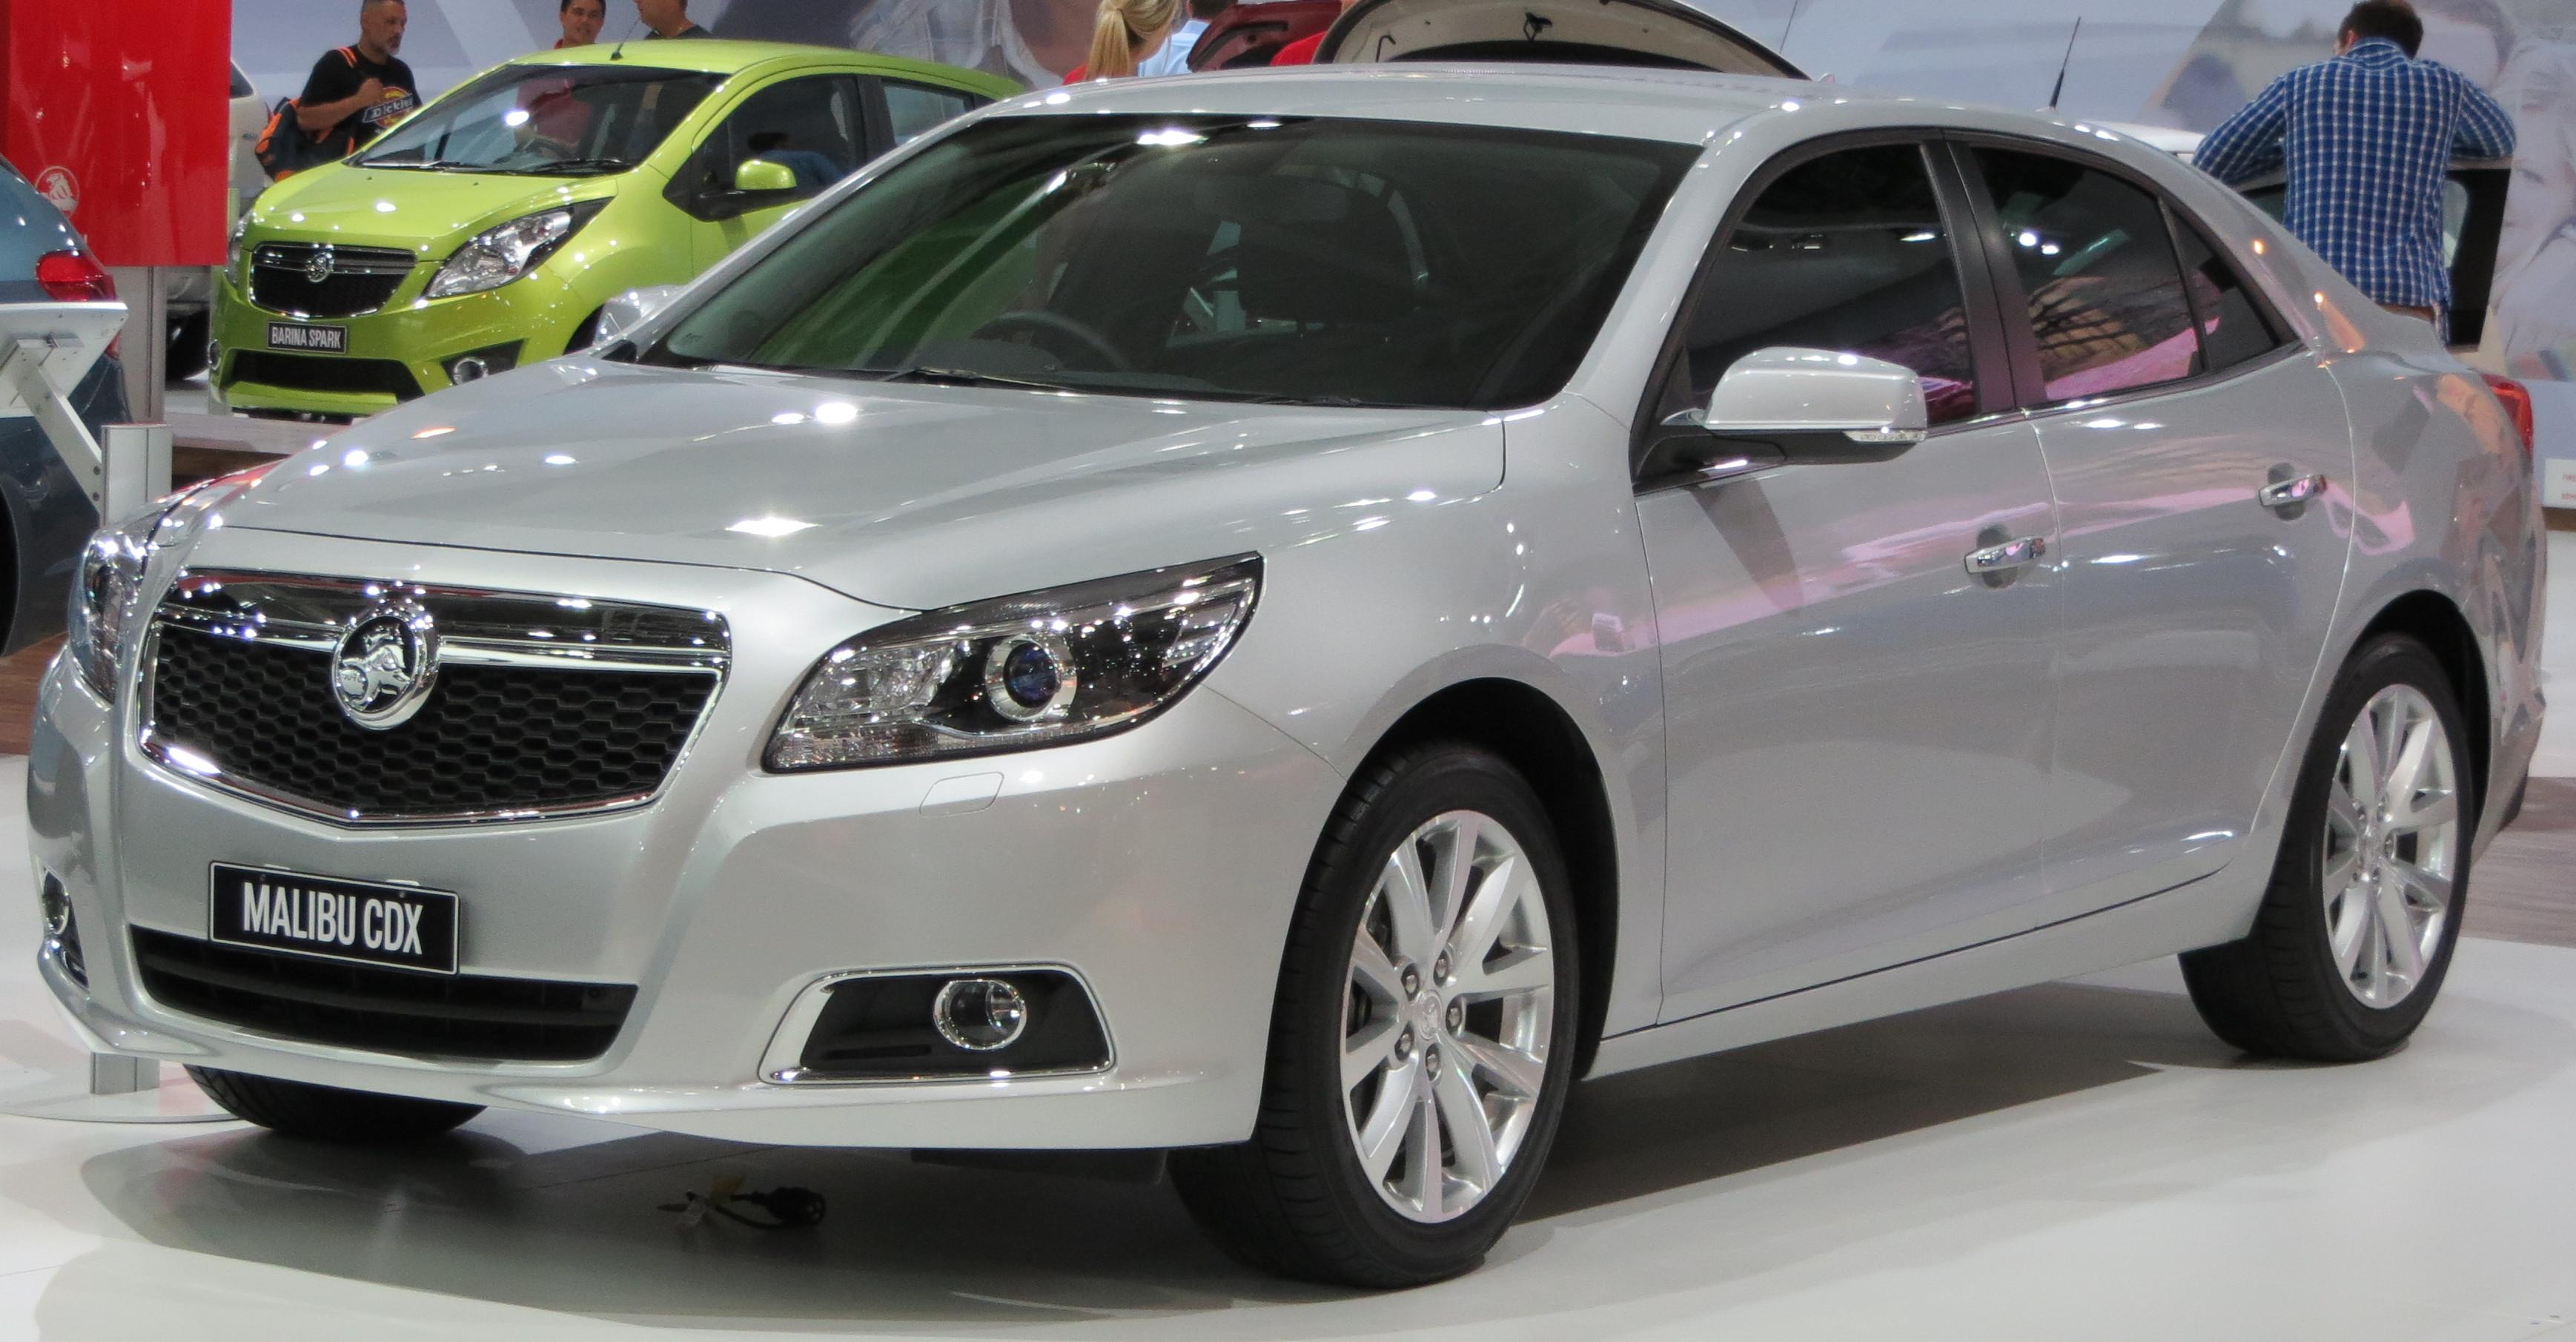 File:2012 Holden Malibu (EM) CDX sedan (2012-10-26) 01.jpg ...